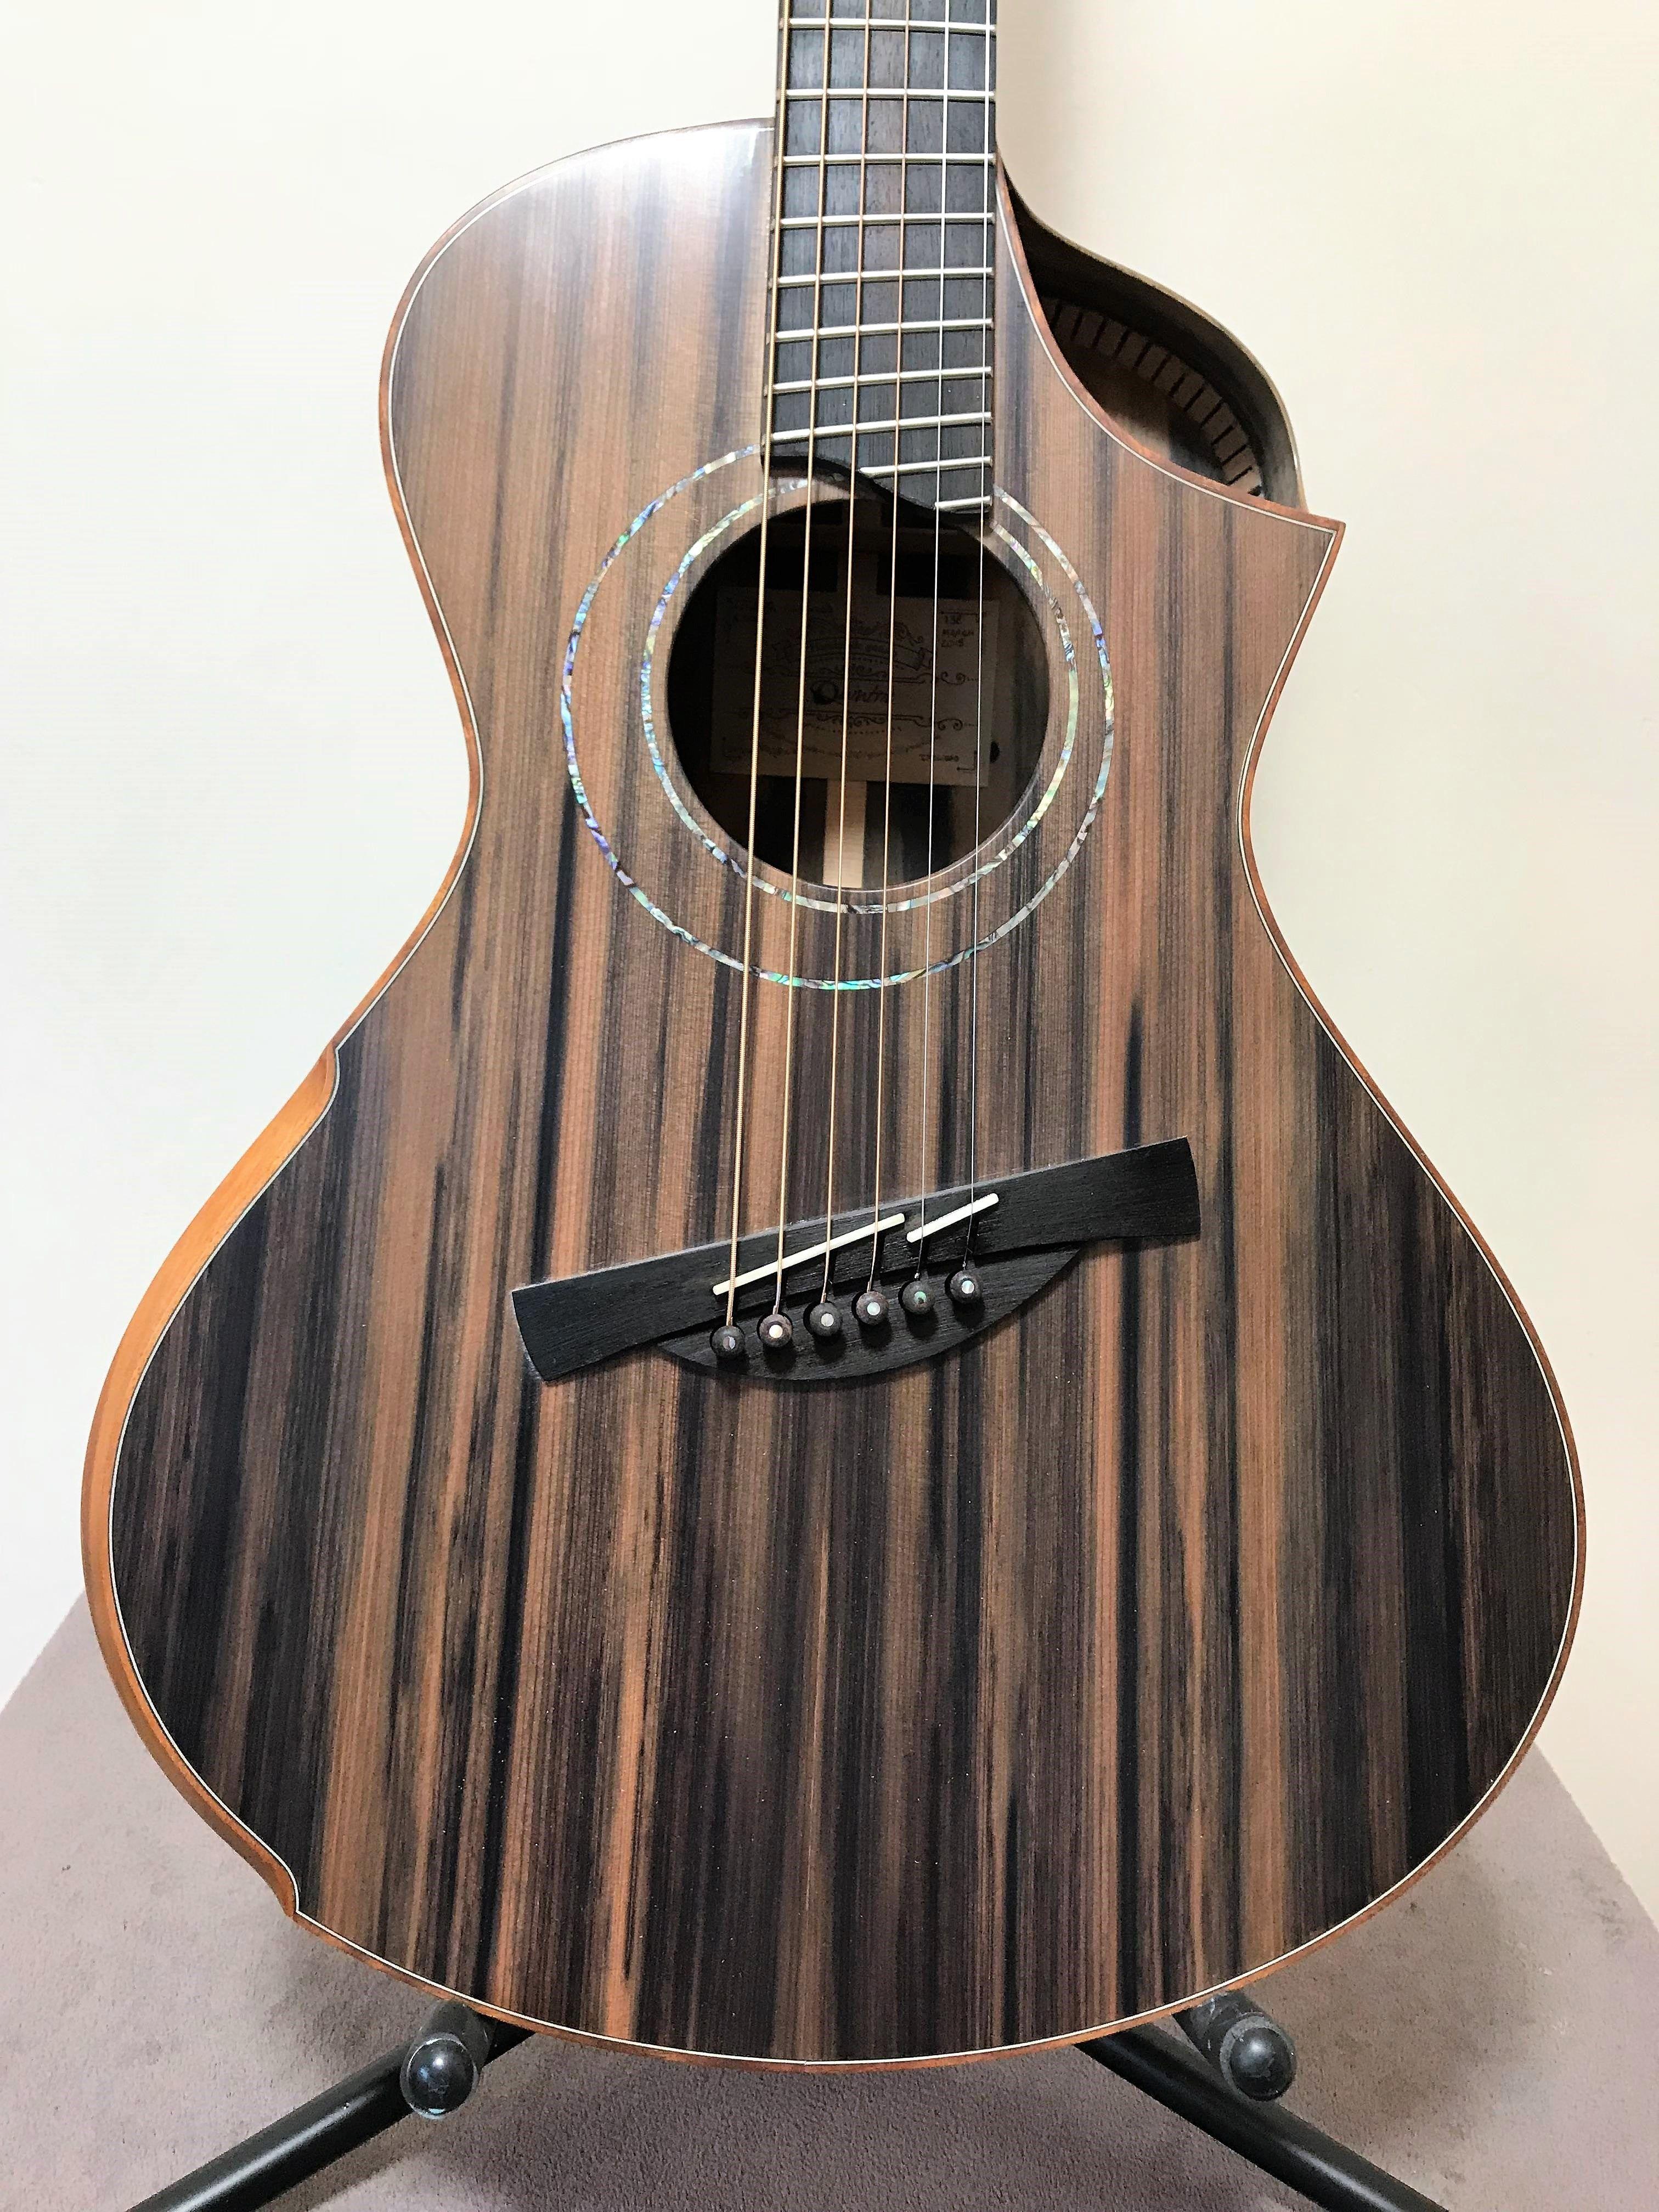 Handmade Guitar Acoustic Guitar Ebony Sinker Redwood Luthier Quintric Guitars Handcrafted Guitar Quality Guitar Handmade Guitar Guitar Design Luthier Guitar